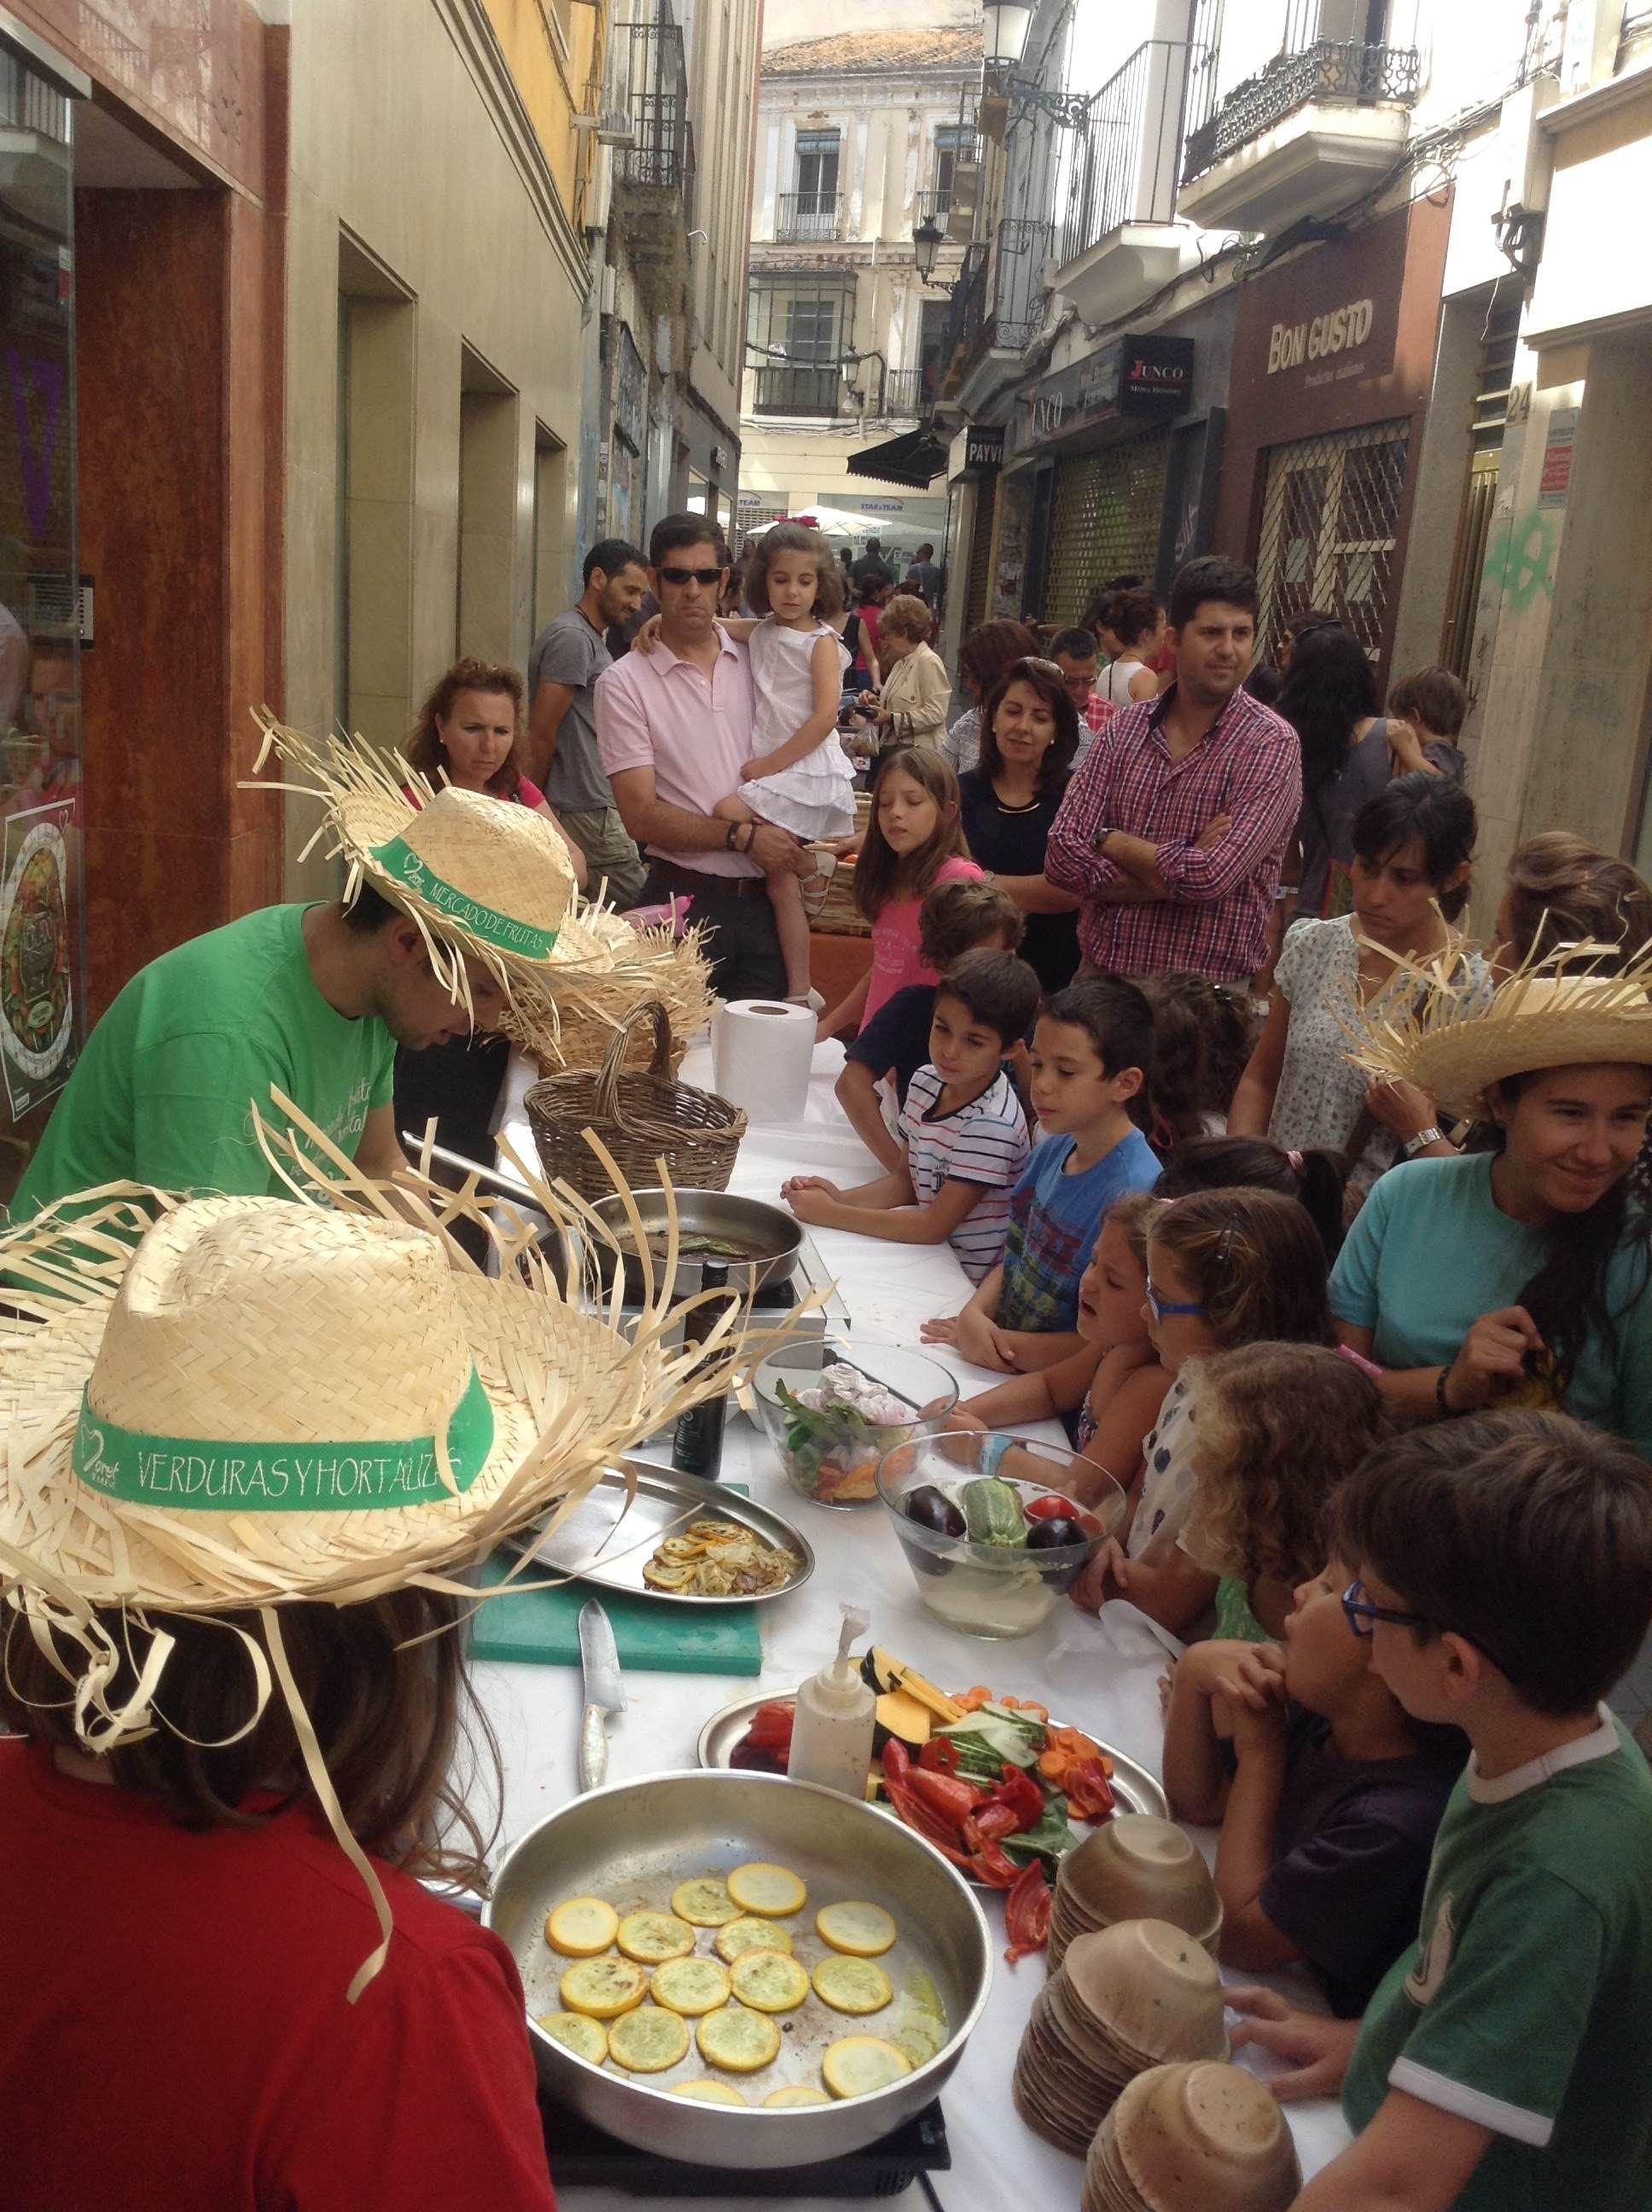 La calle Moret se viste de verde: frutas y verduras ecológicas http://kcy.me/18a8m #mercadoecológico #cáceres